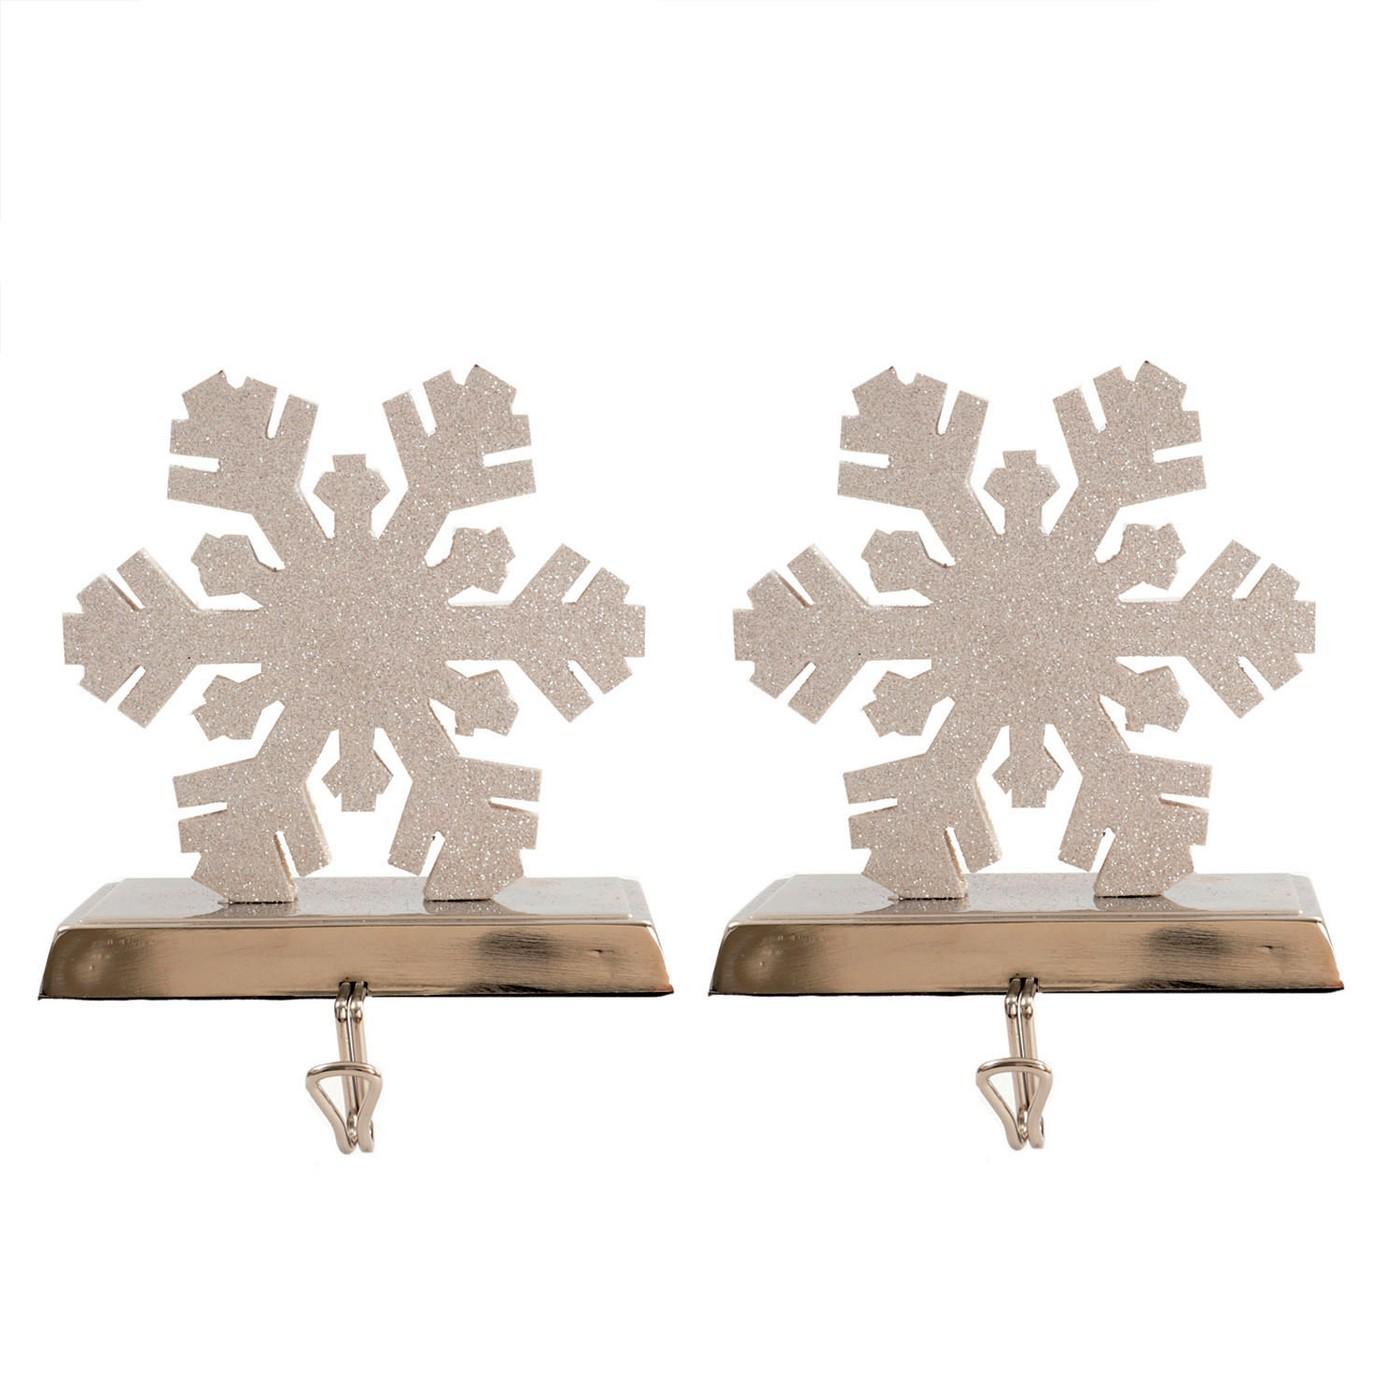 Wood Snowflake Christmas Stocking Holder 2ct - Wondershop™ - image 1 of 2